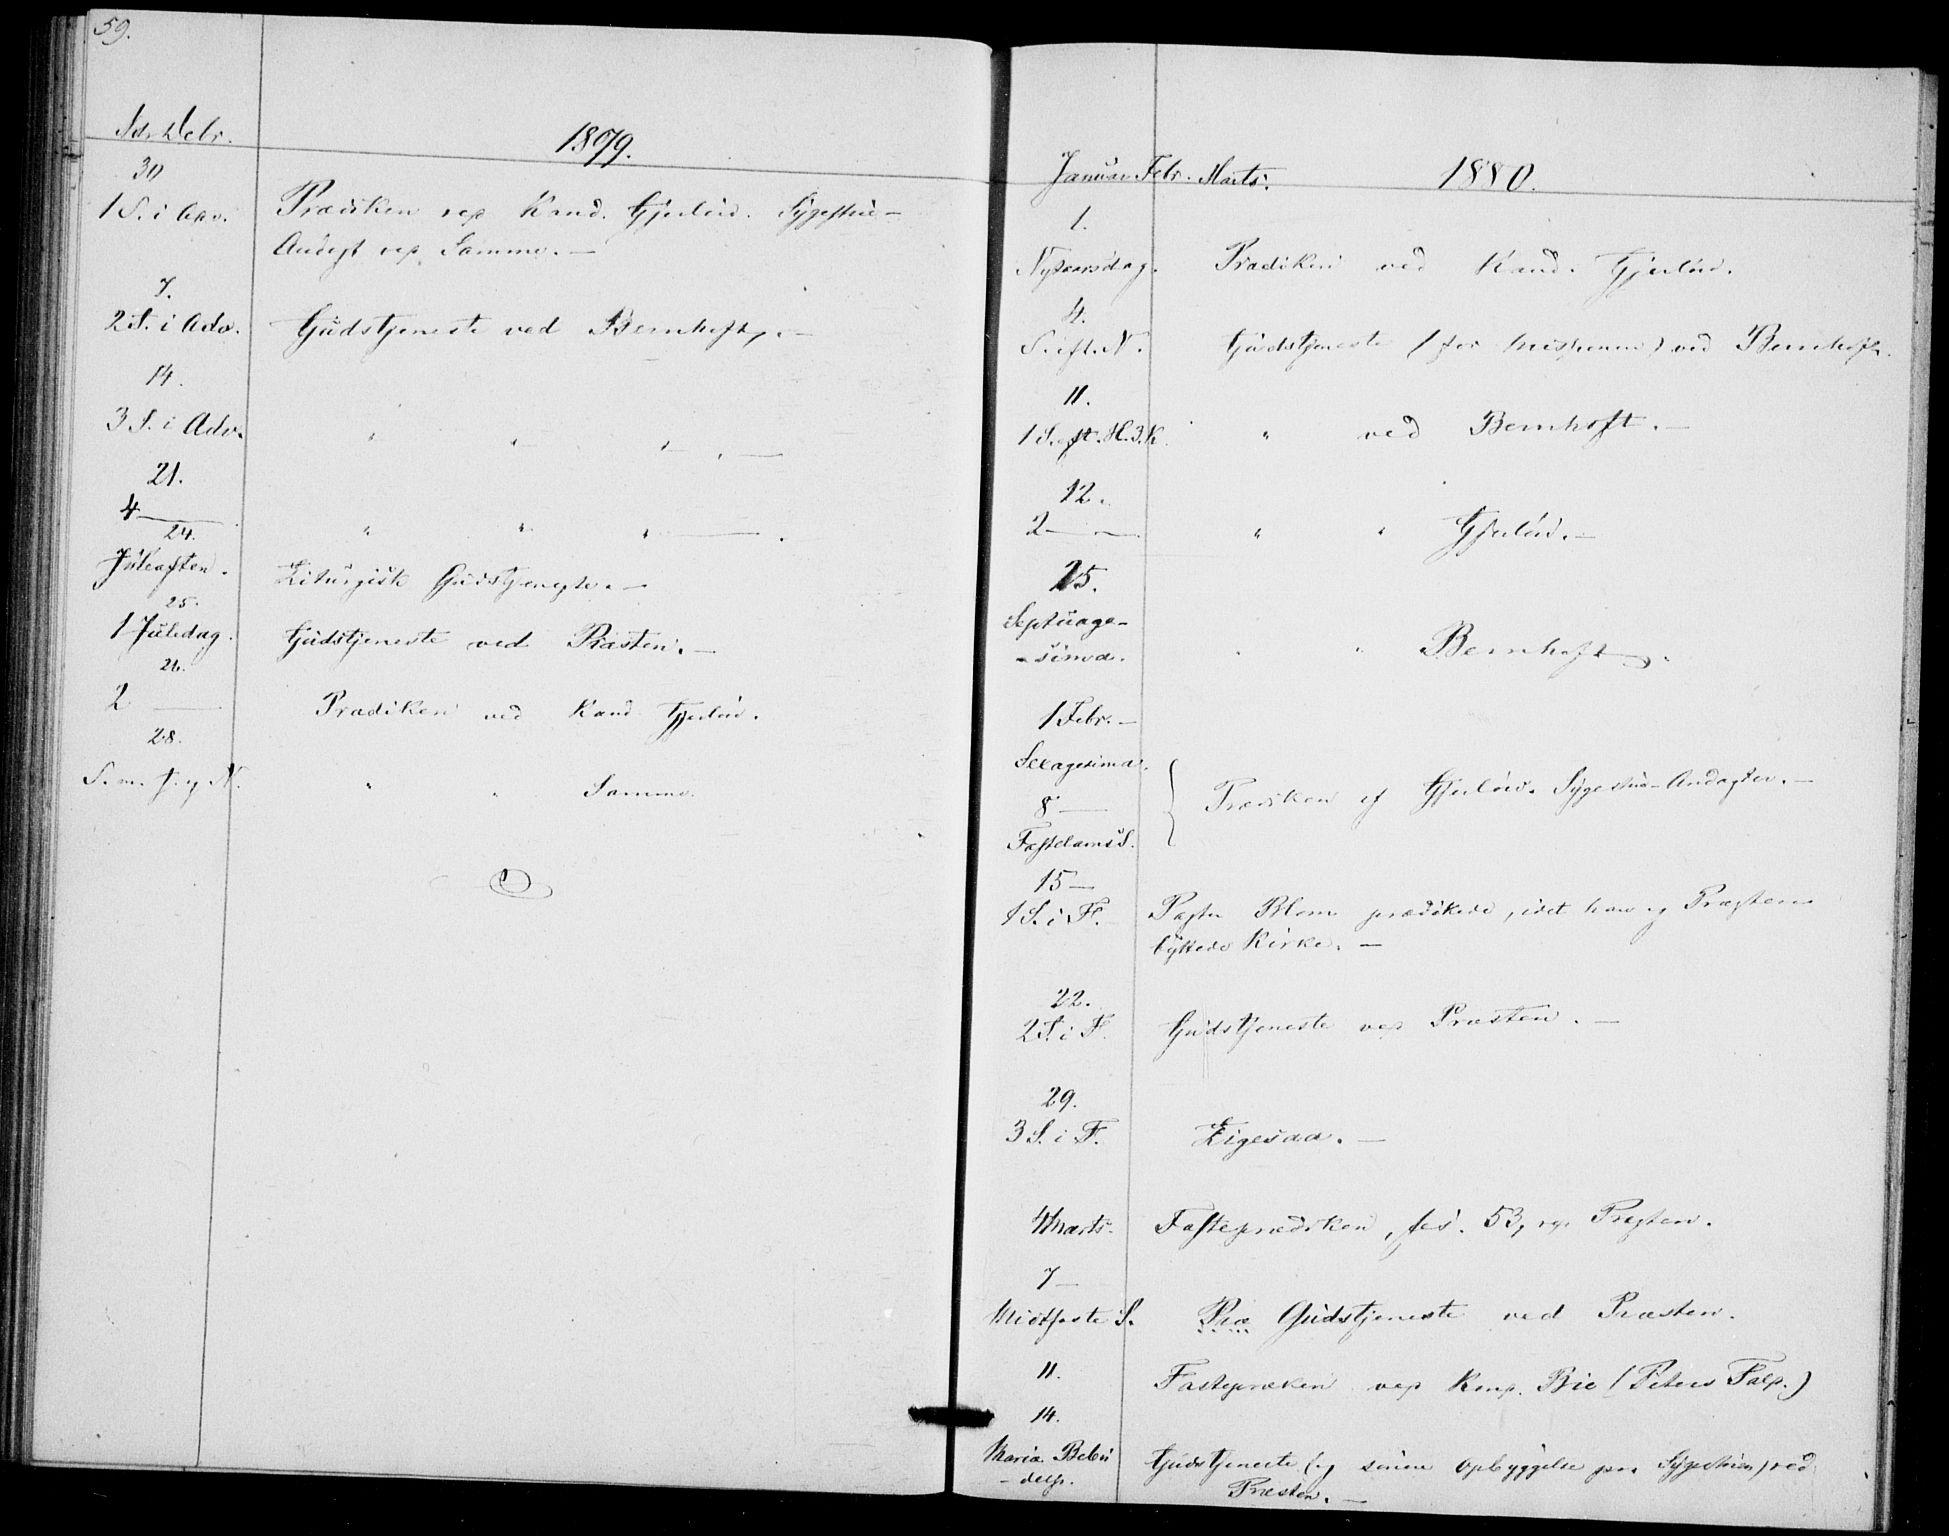 SAO, Akershus festnings slaveri Kirkebøker, F/Fa/L0002: Ministerialbok nr. 2, 1852-1883, s. 59